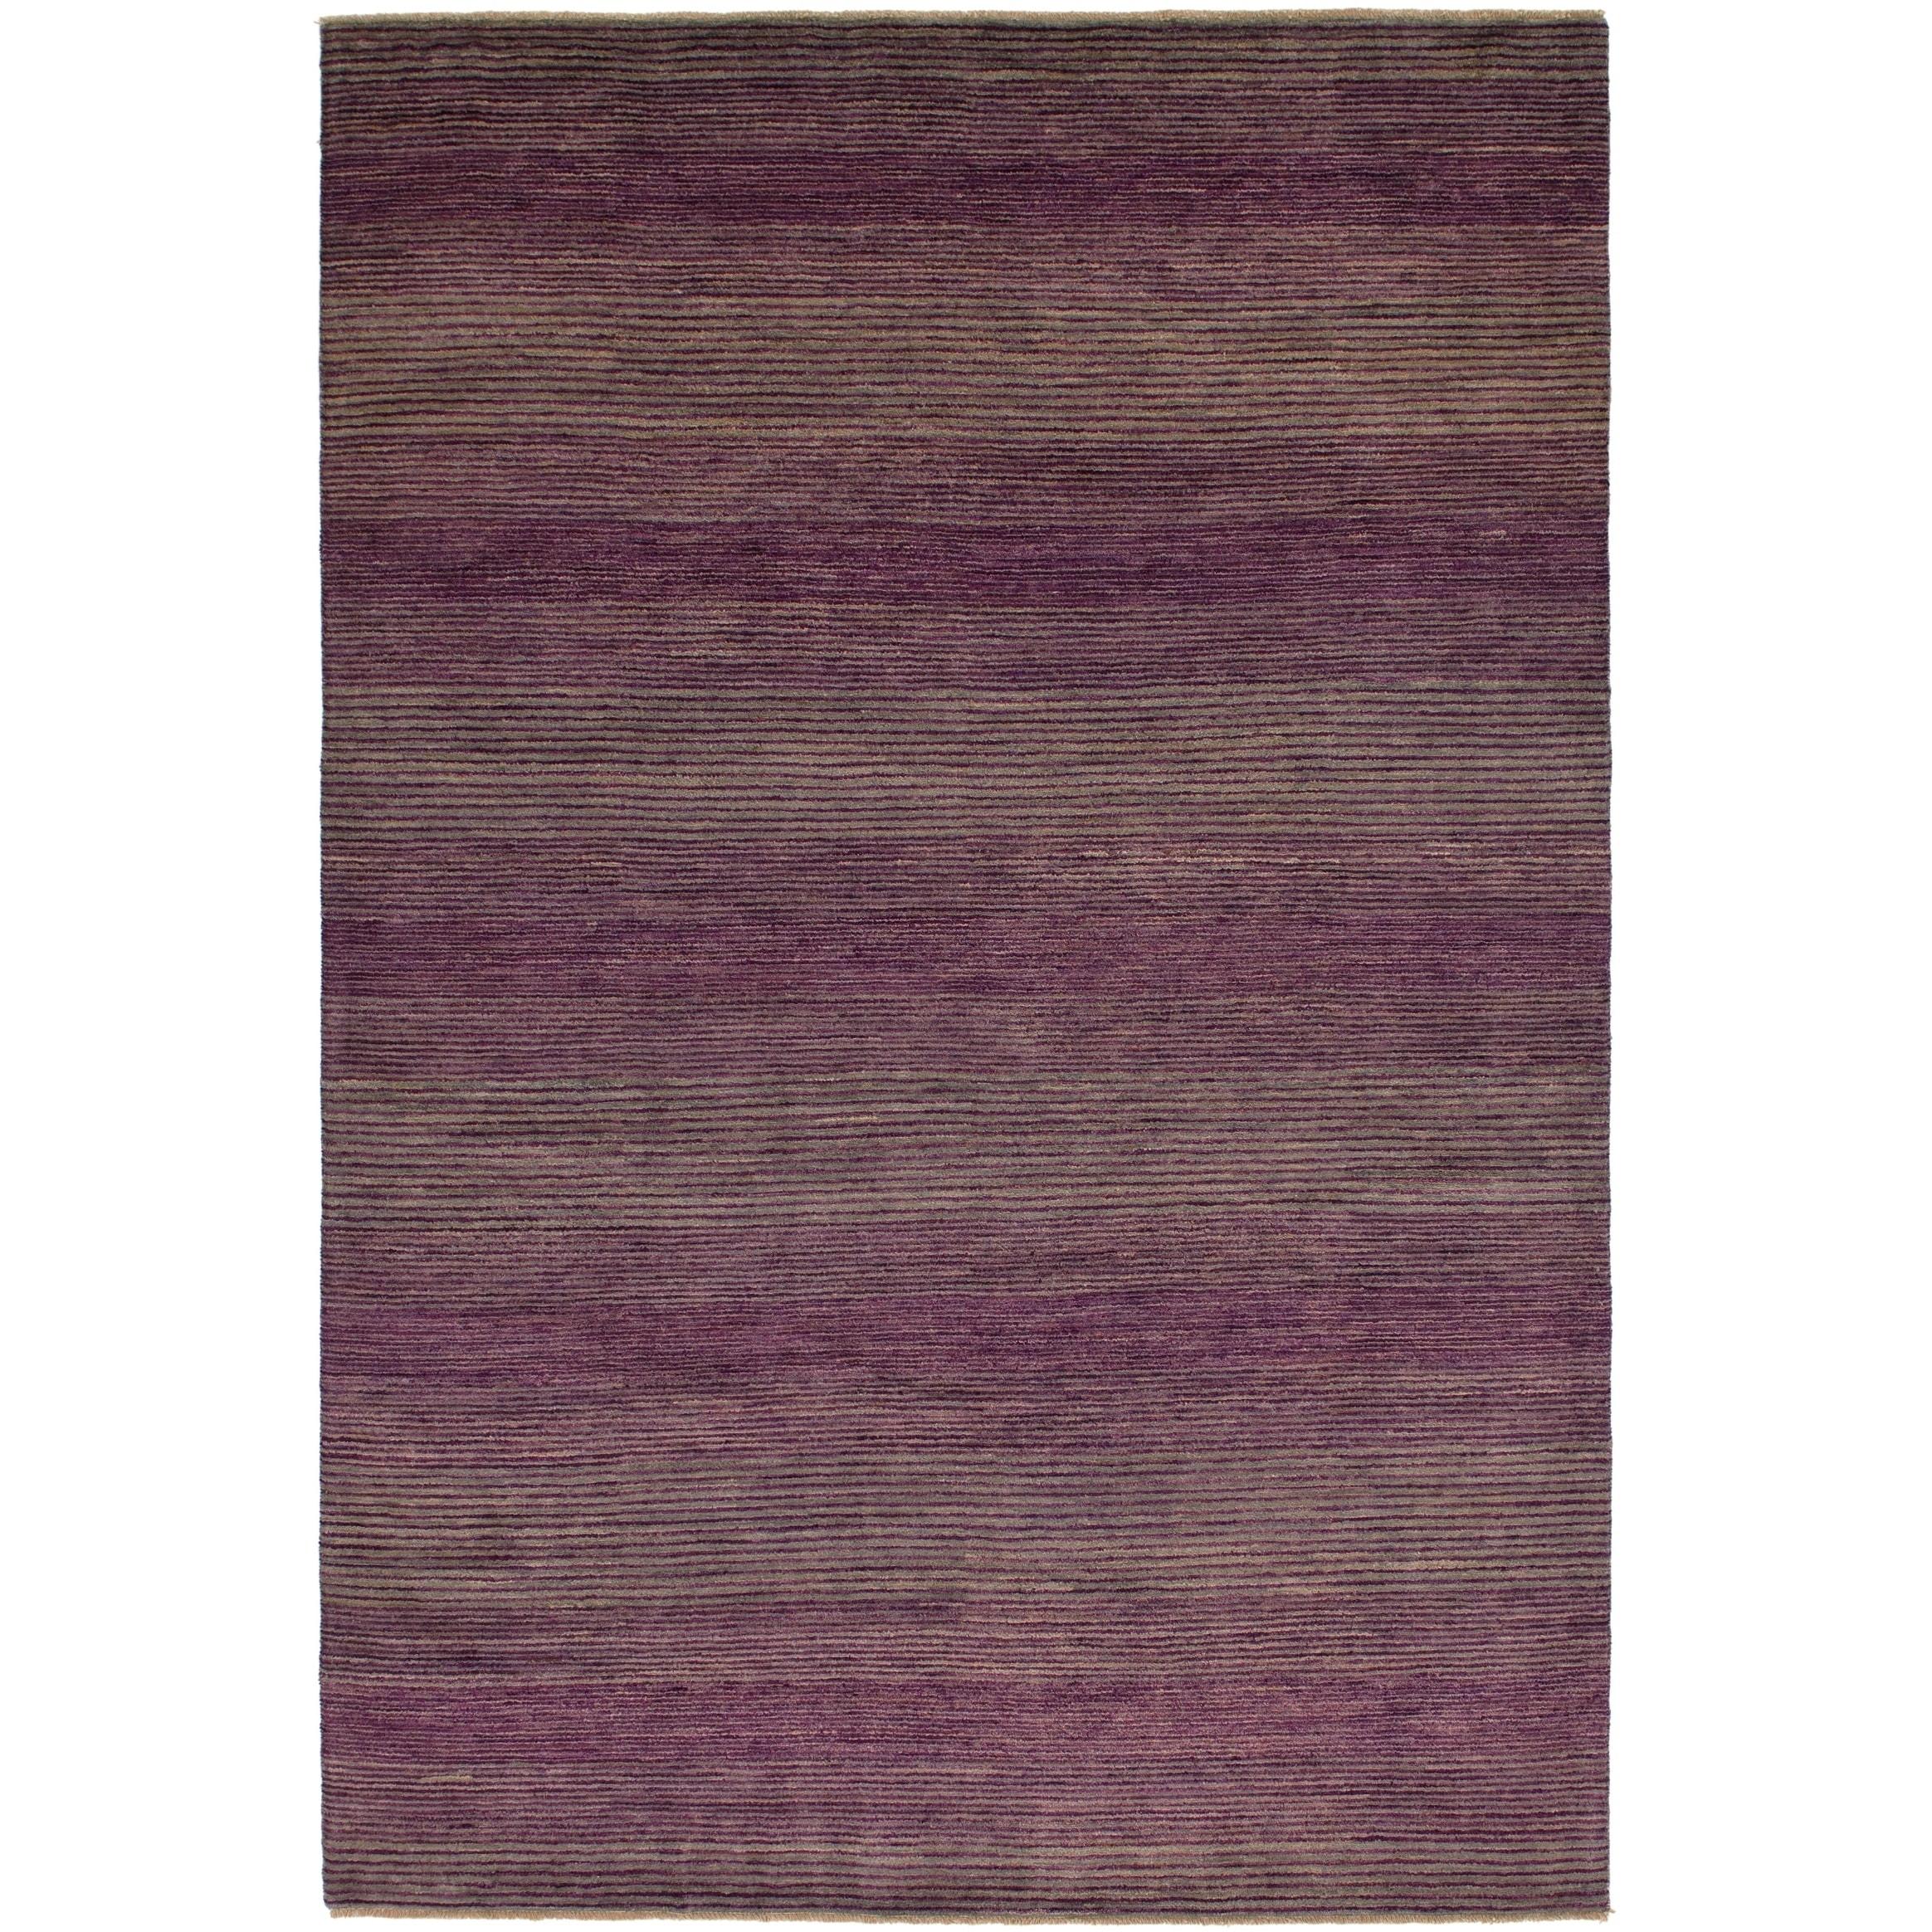 Hand Knotted Kashkuli Gabbeh Wool Area Rug - 6 8 x 10 (Purple - 6 8 x 10)